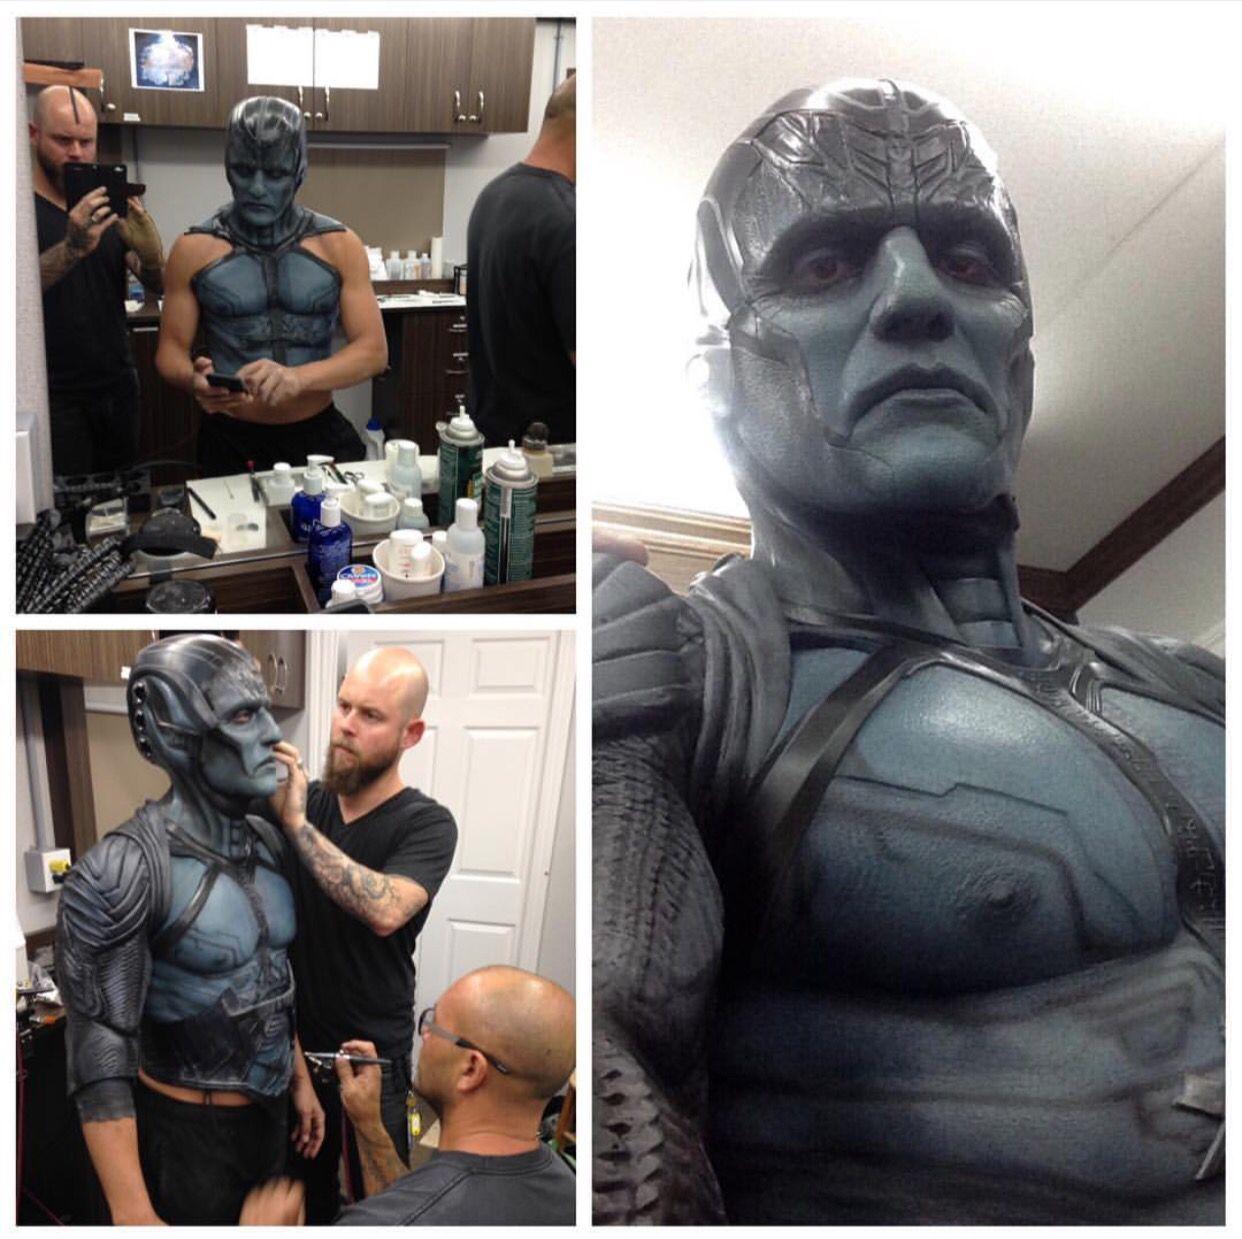 Special Fx Makeup Work Done On Oscar Isaac For X Men Apocalypse Briansipemakeup Instagram Oscar Isaac Marvel Villains X Men Apocalypse